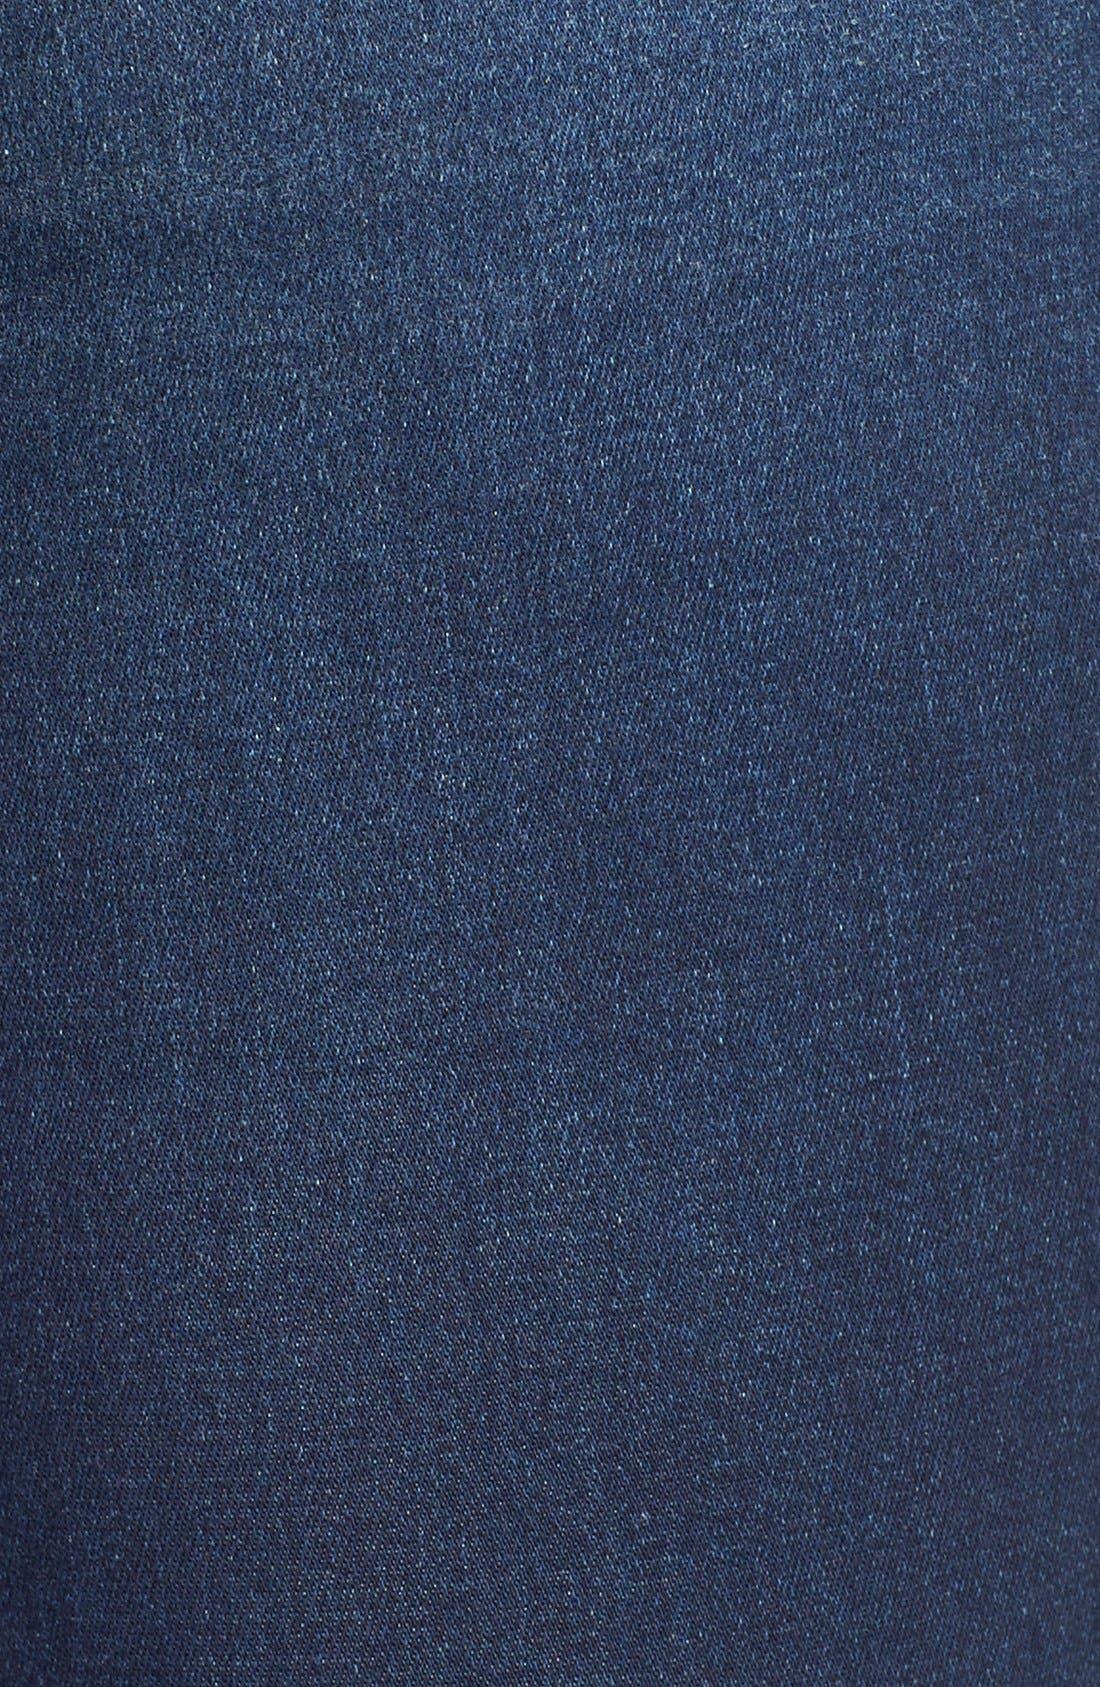 Alternate Image 5  - M.i.h. Jeans 'Superfit Marrakesh' Flare Jeans (Circle Blue)